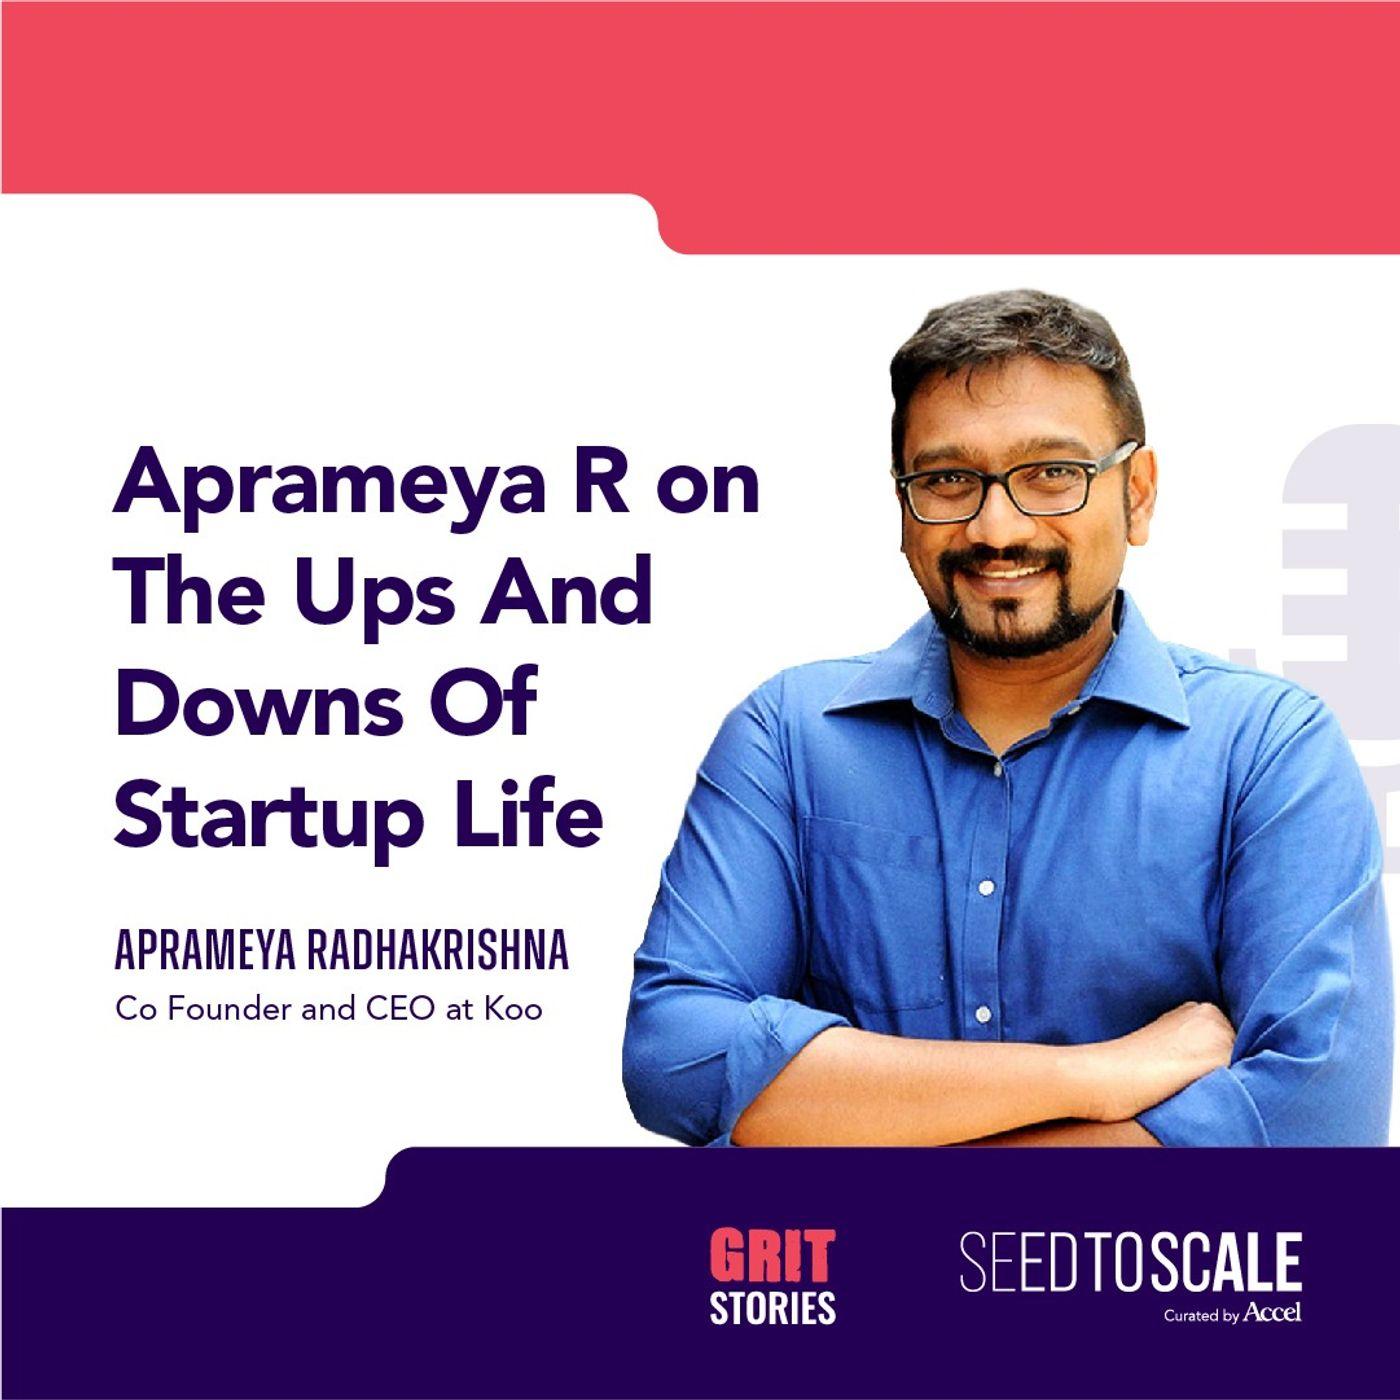 INSIGHTS #68: GRIT Stories | Aprameya Radhakrishna on the ups and downs of startup life